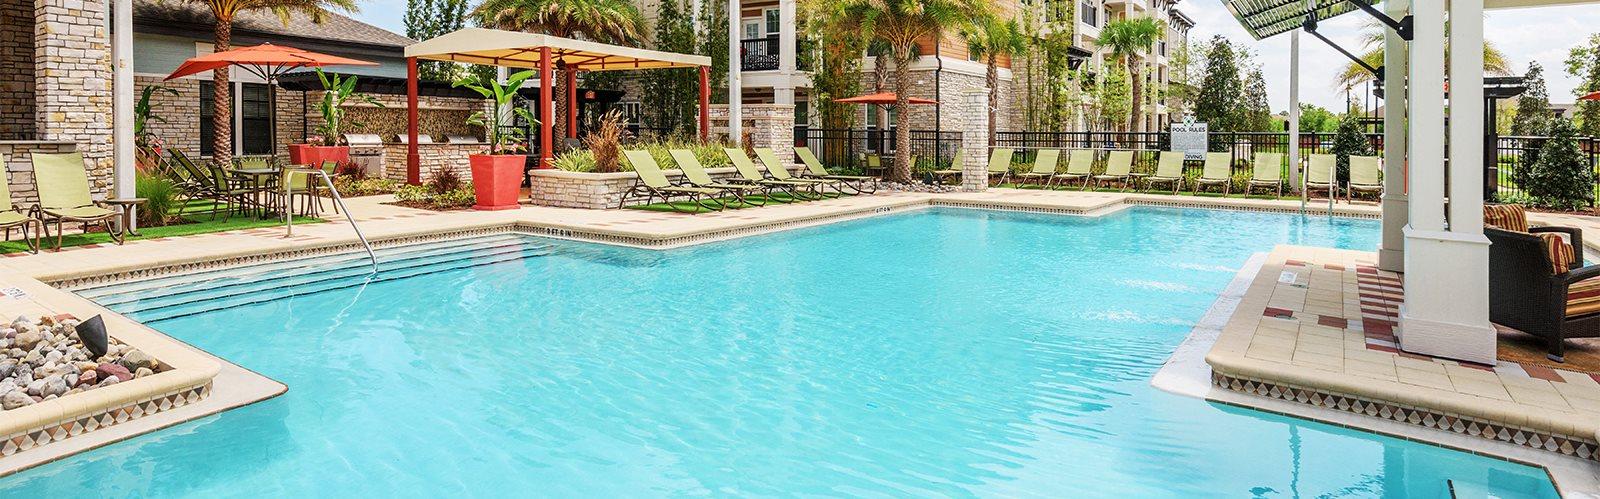 Nona Park Village Apartments pool area